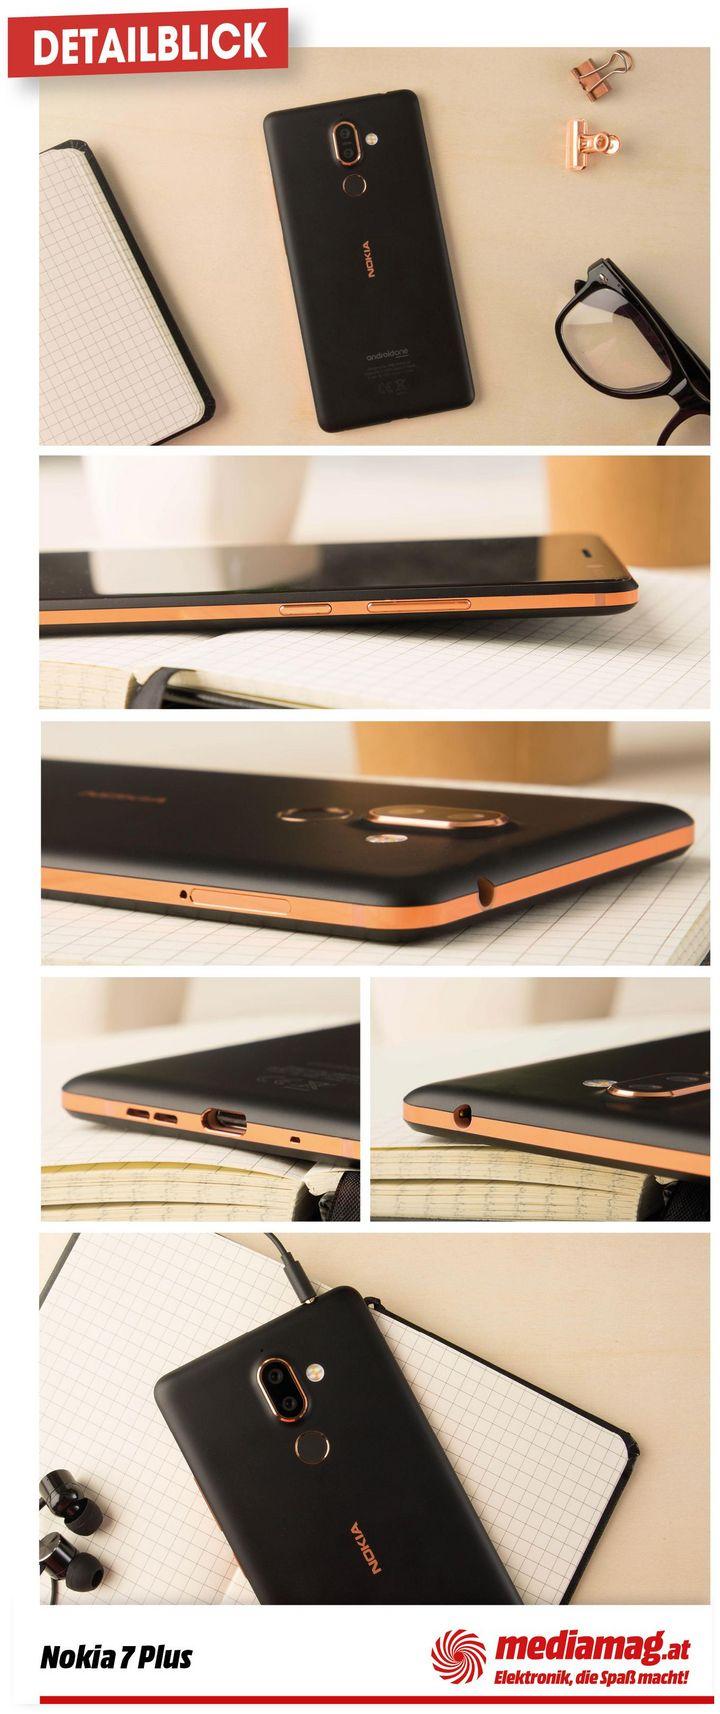 Nokia 7 Plus Top